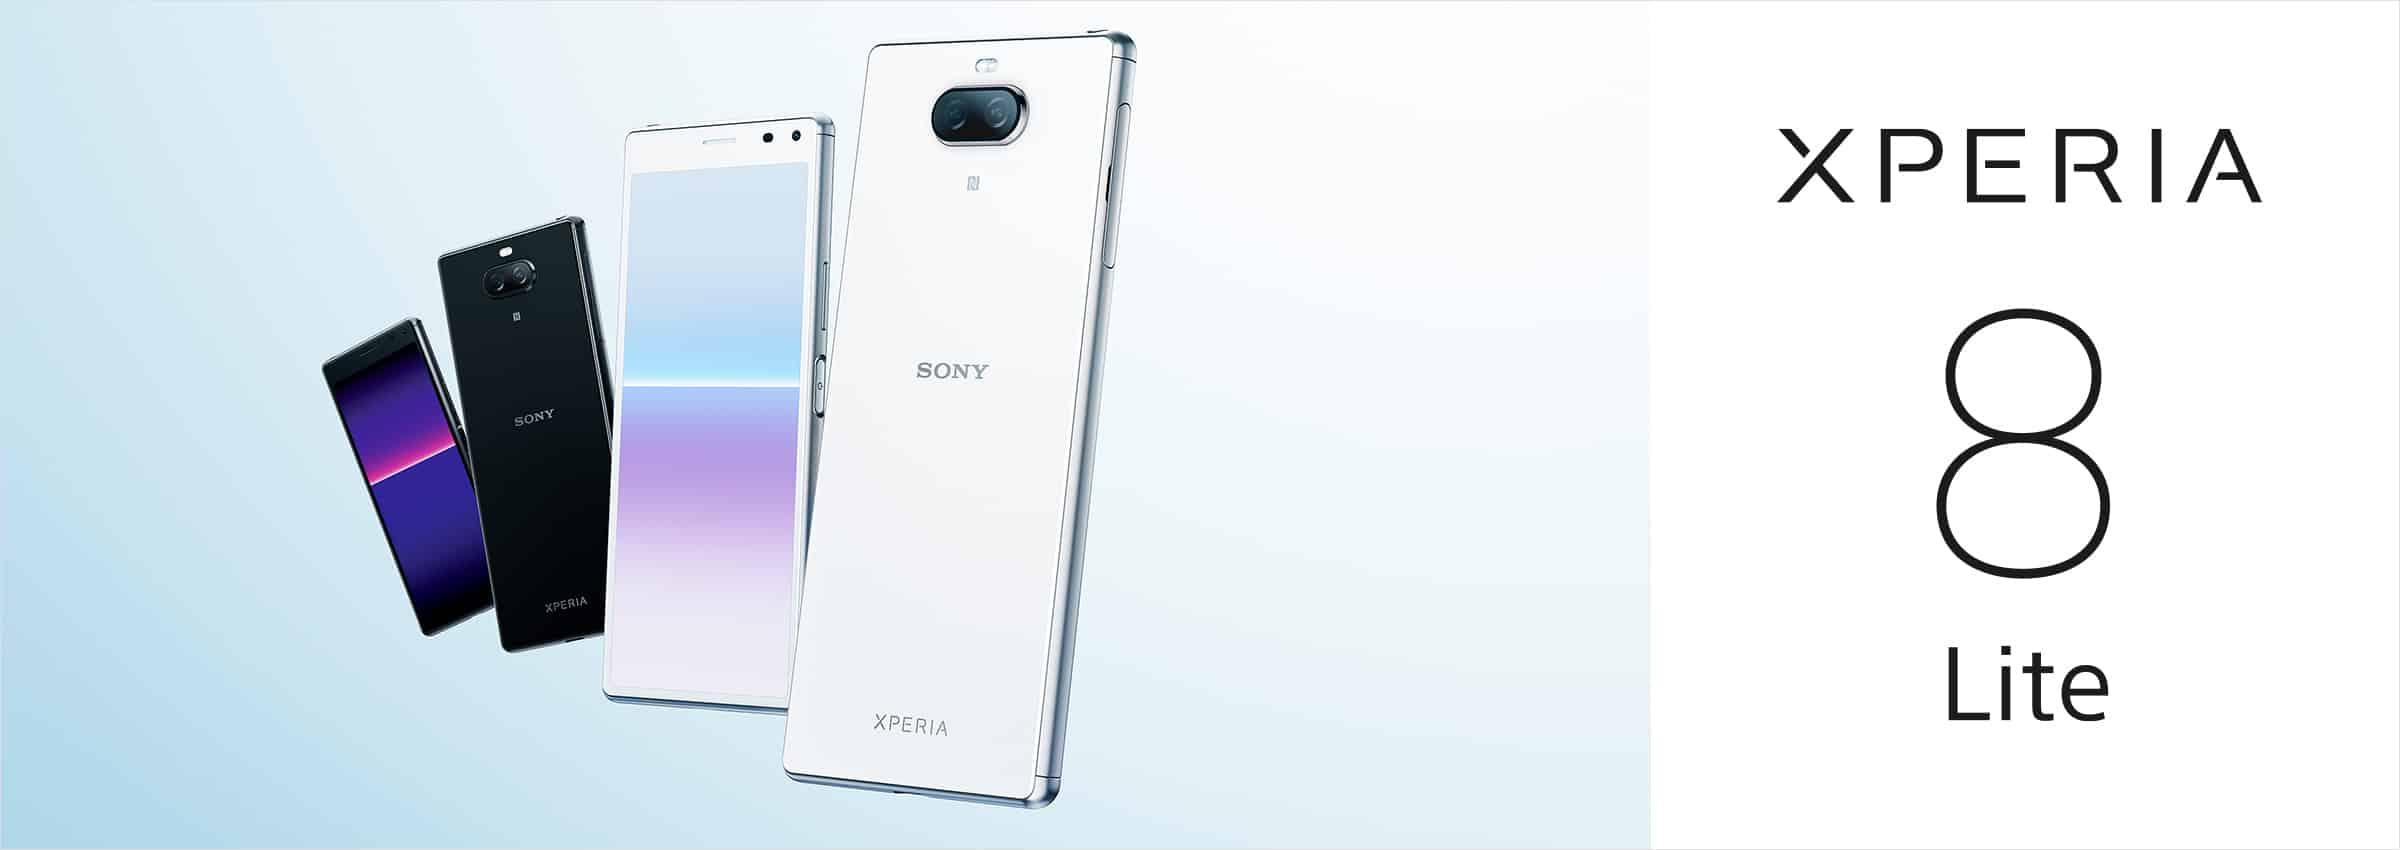 Sony Xperia 8 Lite image 1